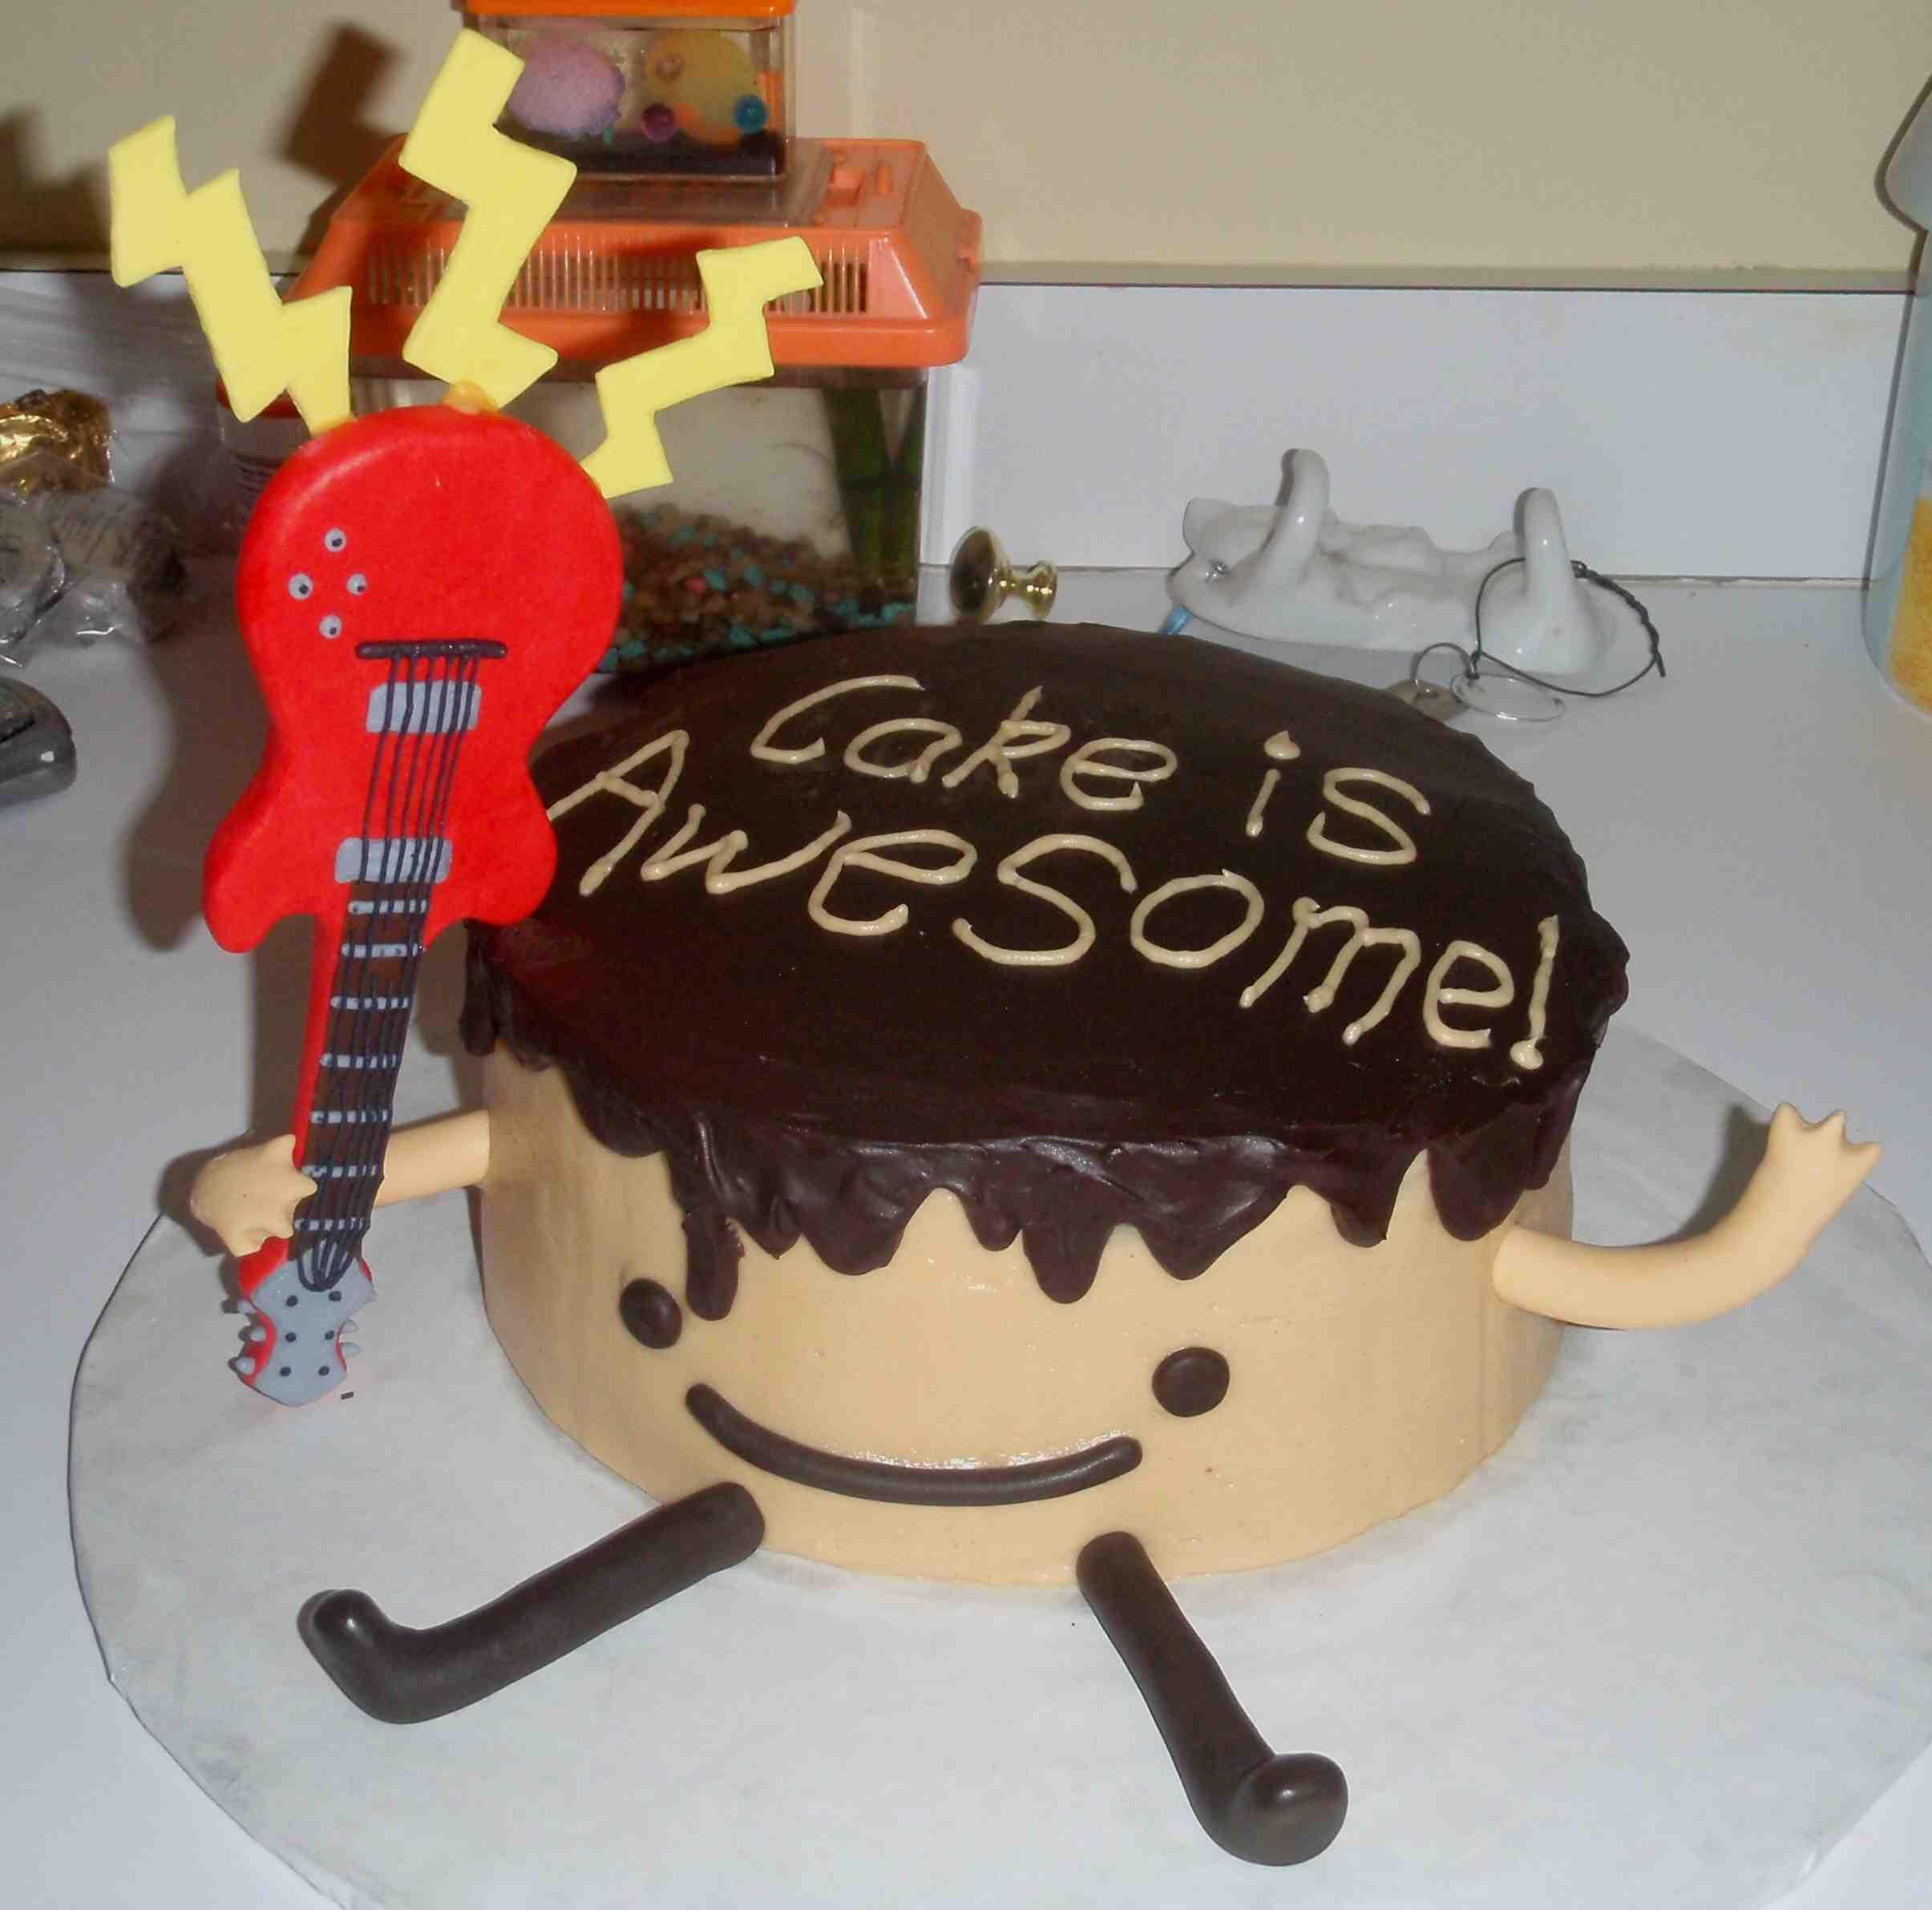 Cake Images Awesome : awesome cake designs MEMEs